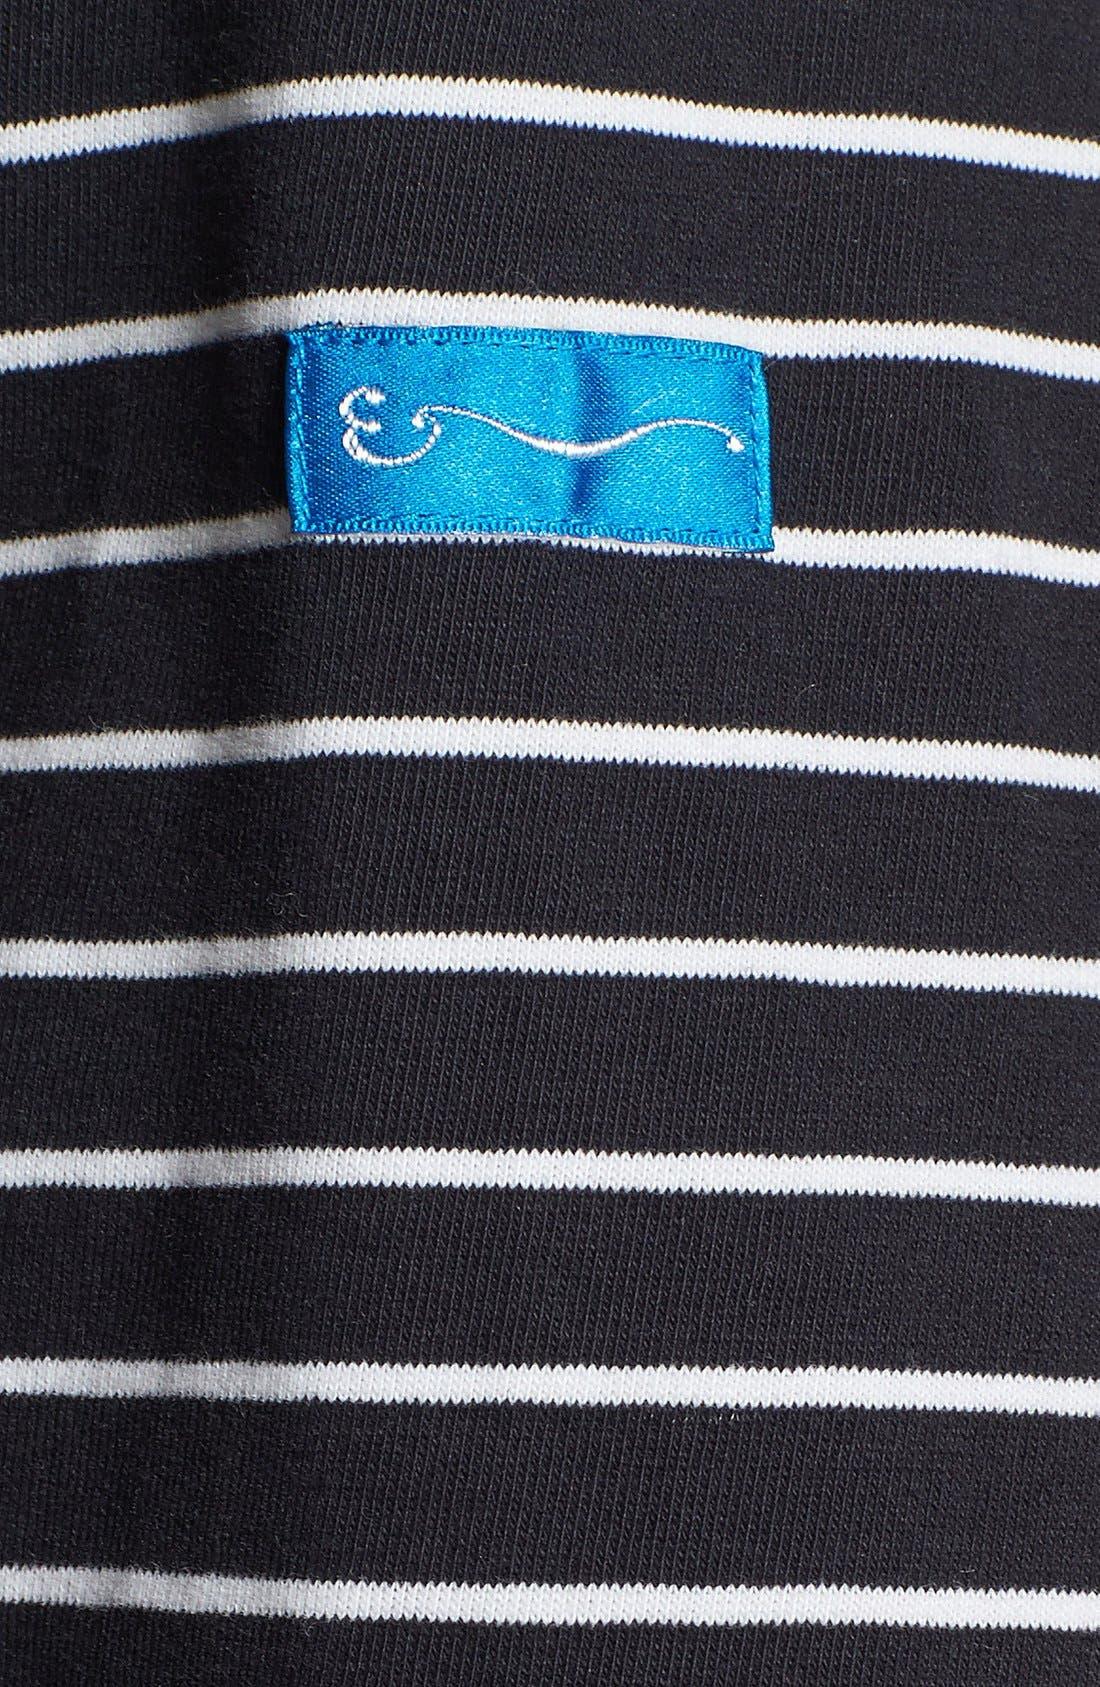 SHIPLEY & HALMOS, 'Spaniel' Stripe Long Sleeve T-Shirt, Alternate thumbnail 2, color, 414